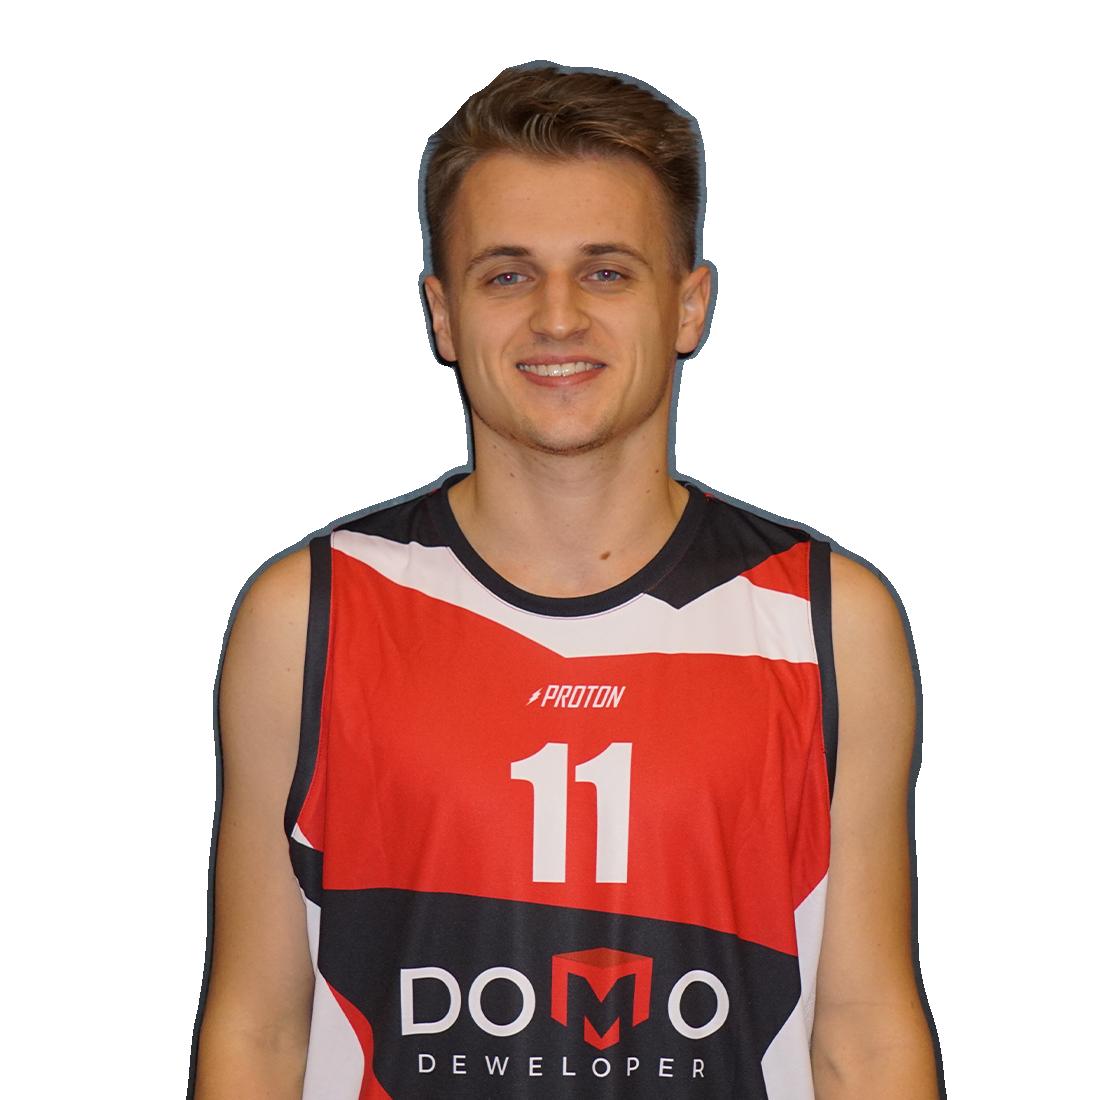 Tomasz Spaleniak